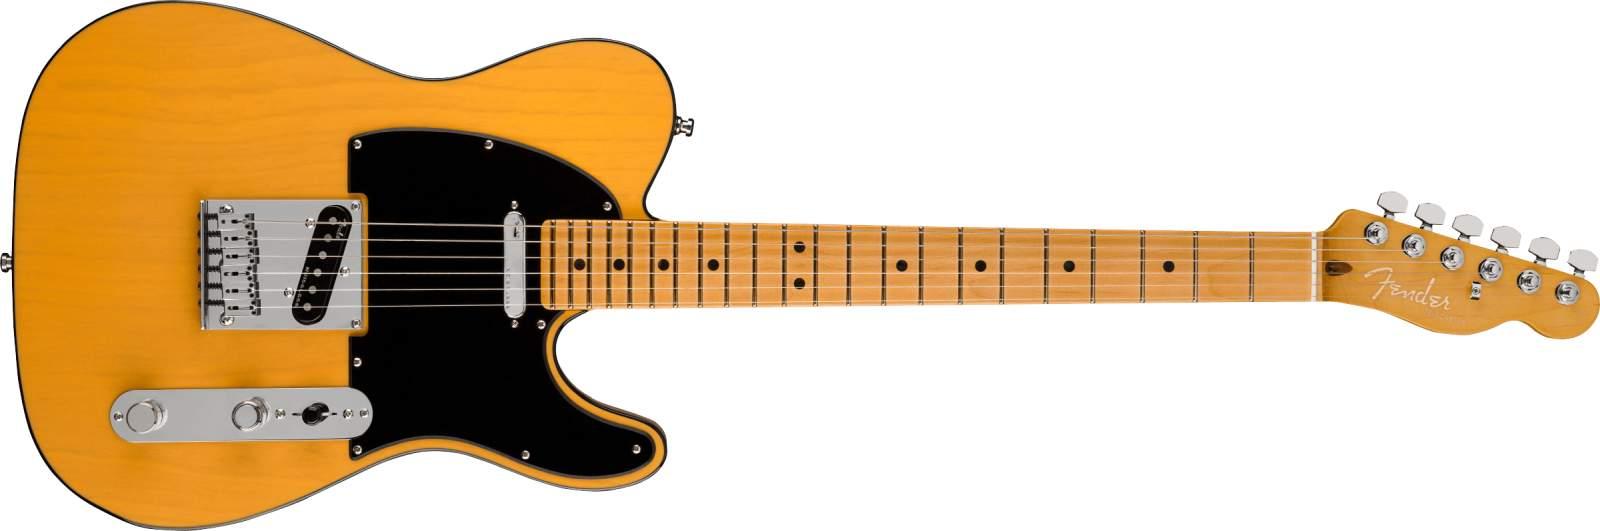 Fender American Ultra Telecaster MN BSB